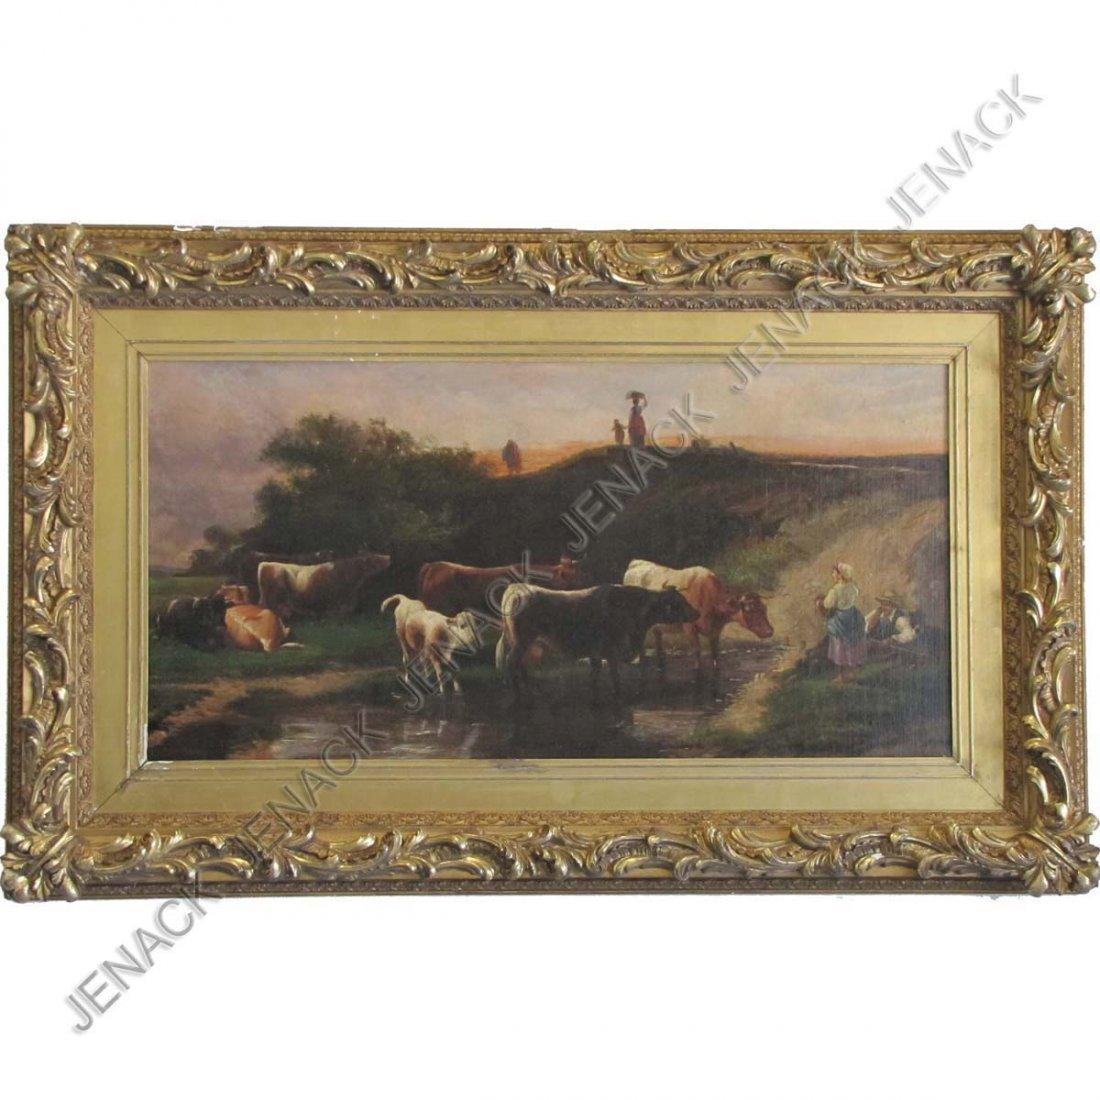 247: EDOUARD DEBAT-PONSAN (FRENCH 1847-1913) OIL